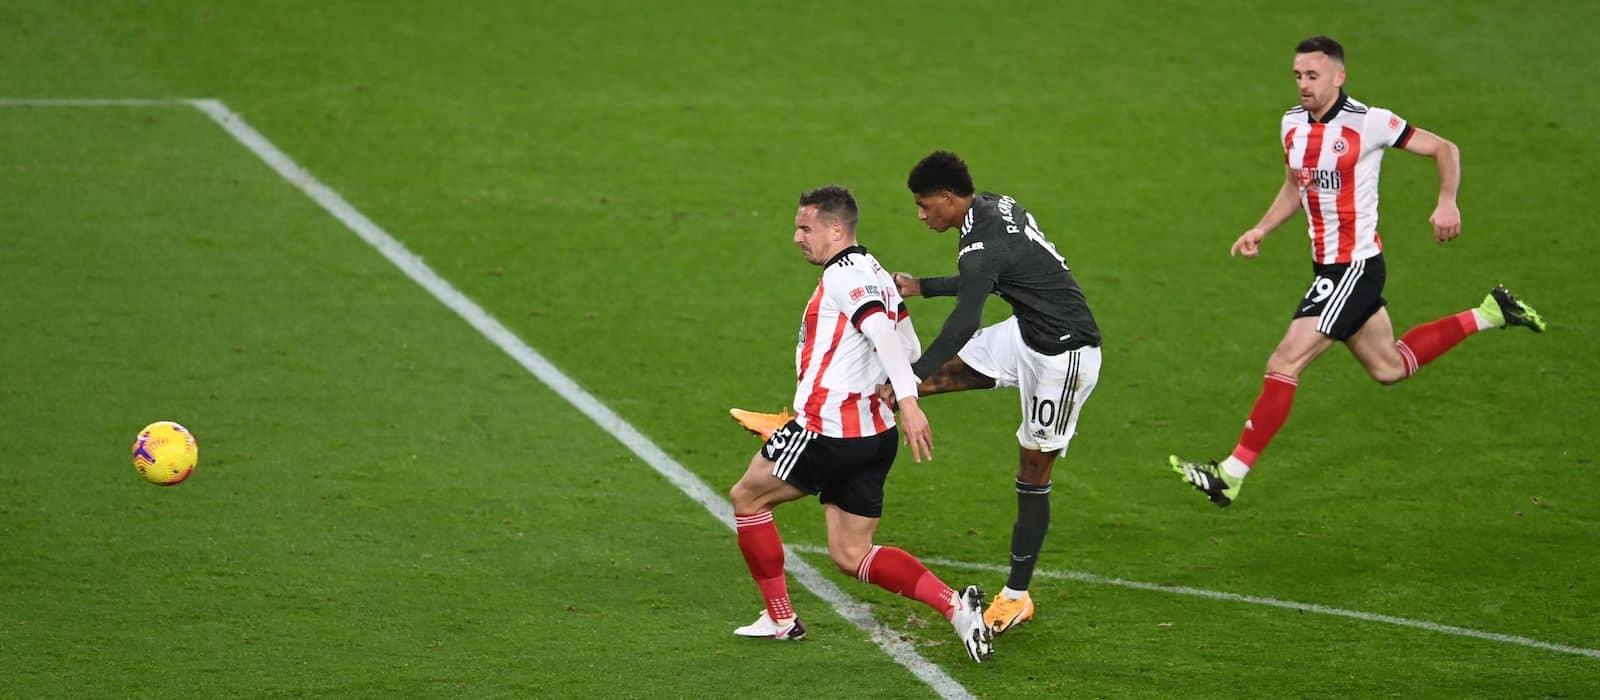 'Different class'- Manchester United fans praise Marcus Rashford's performance